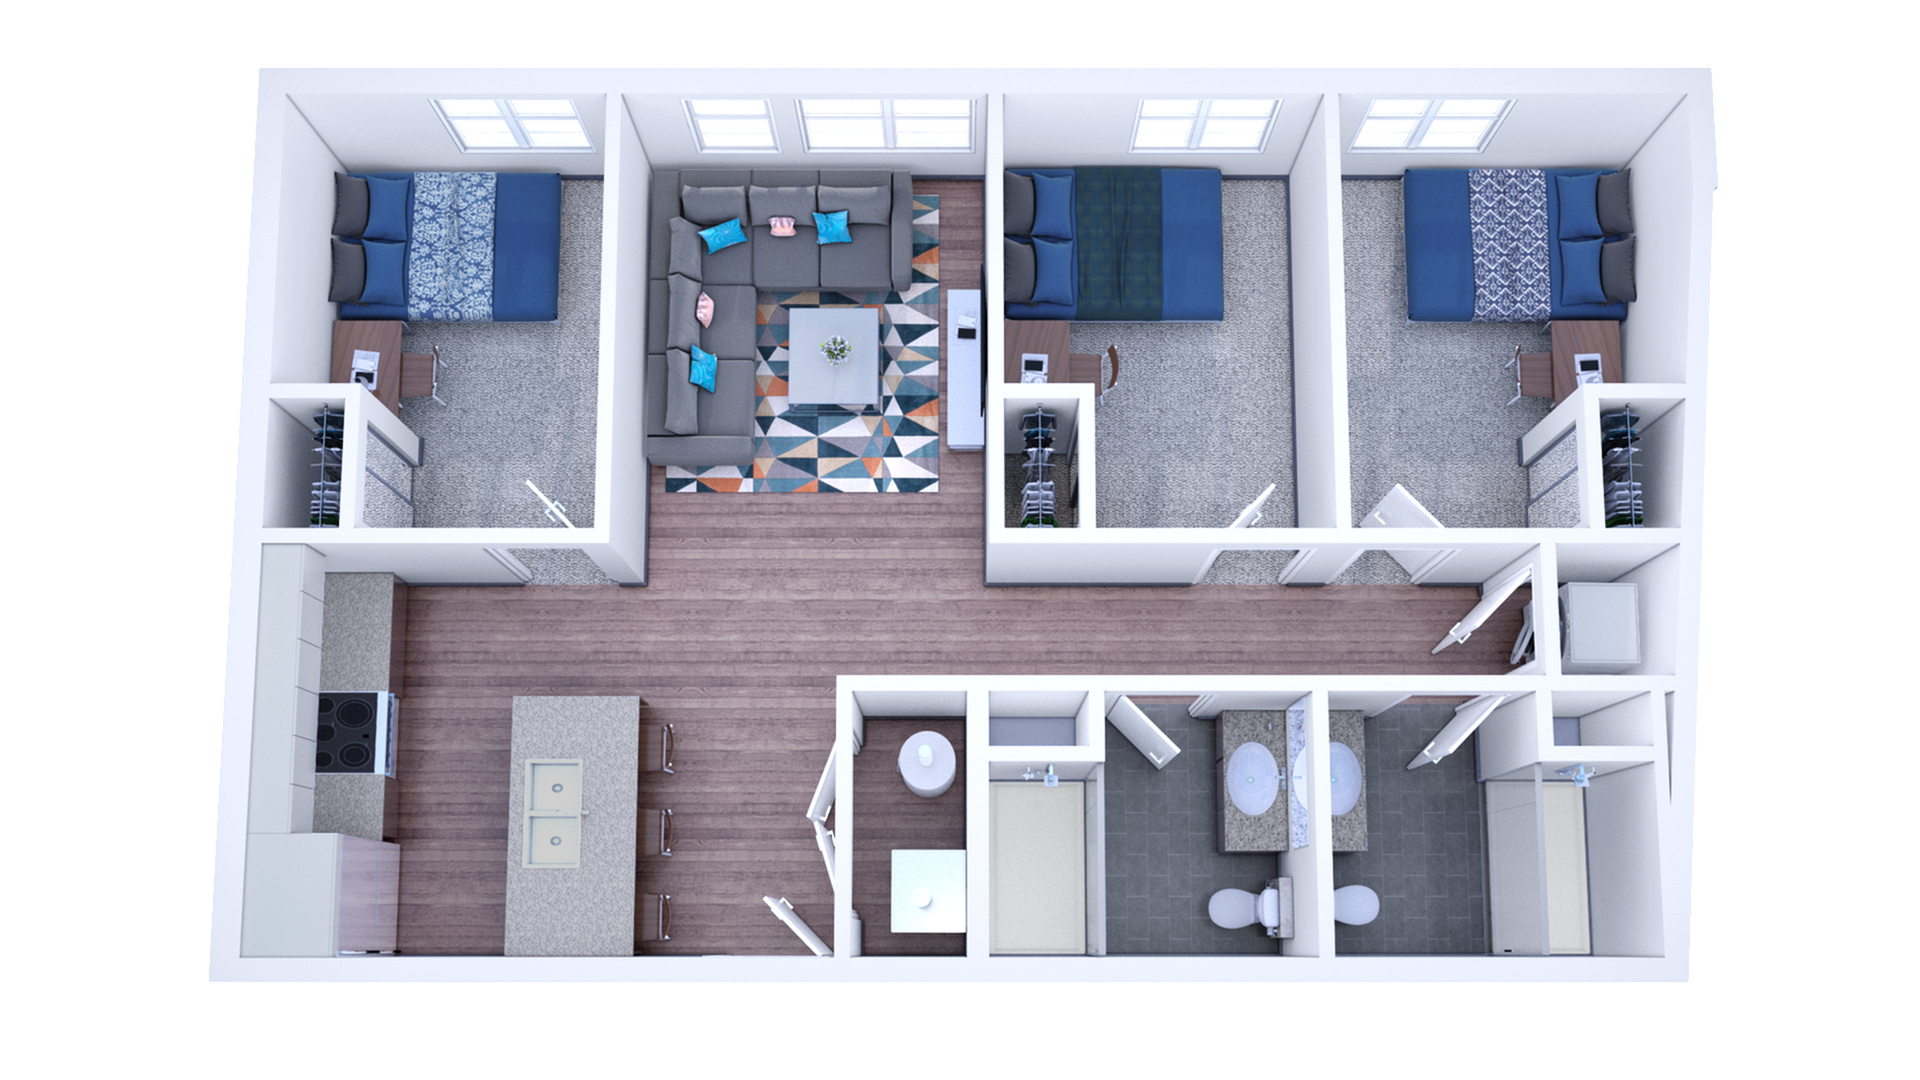 3 X 2 Premium 3 Bed Apartment Student Housing Evolve Siu